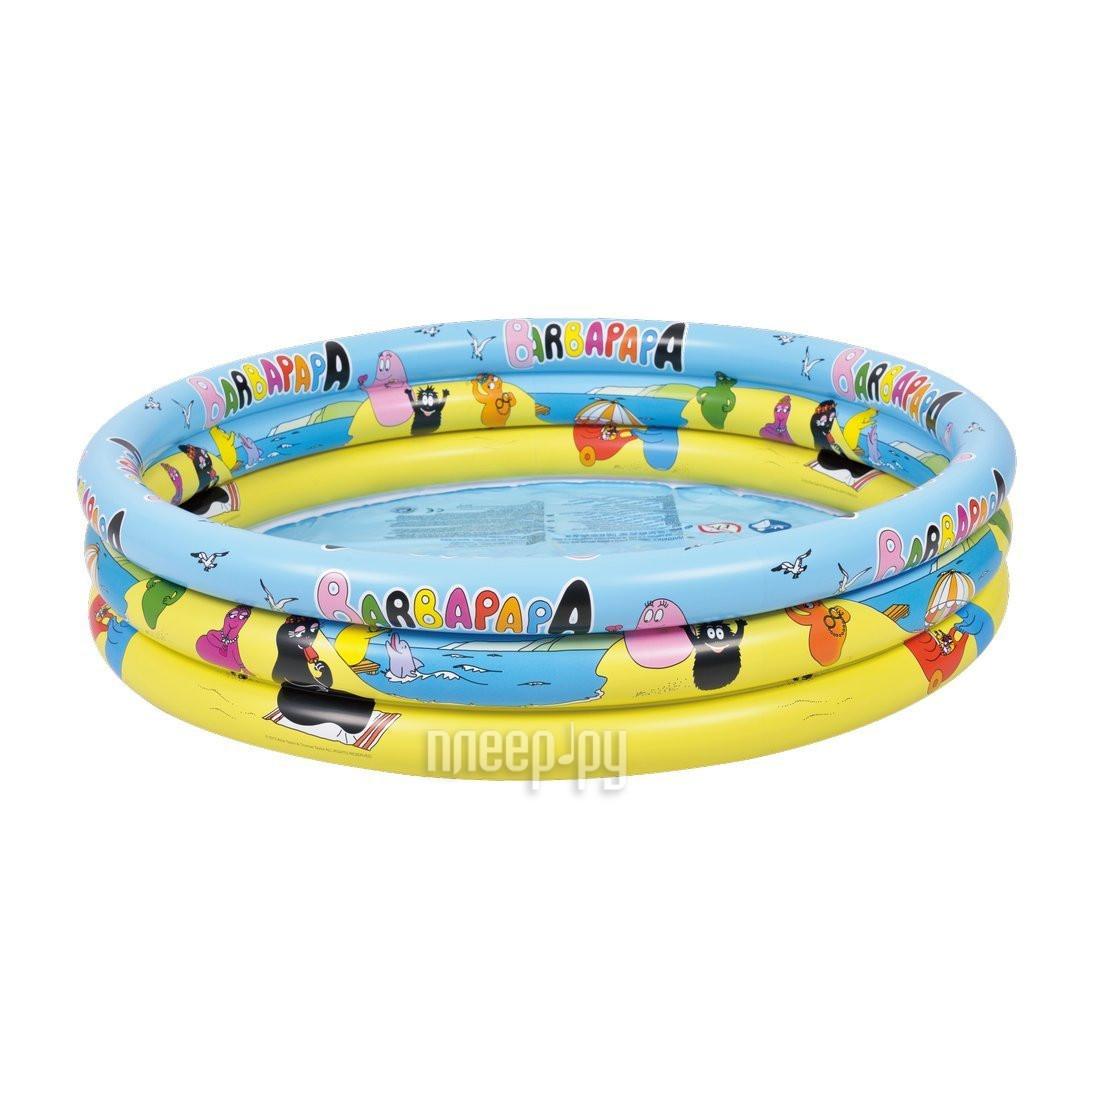 Детский бассейн Jilong Barbapapa 3-ring Pool JL017379NPF